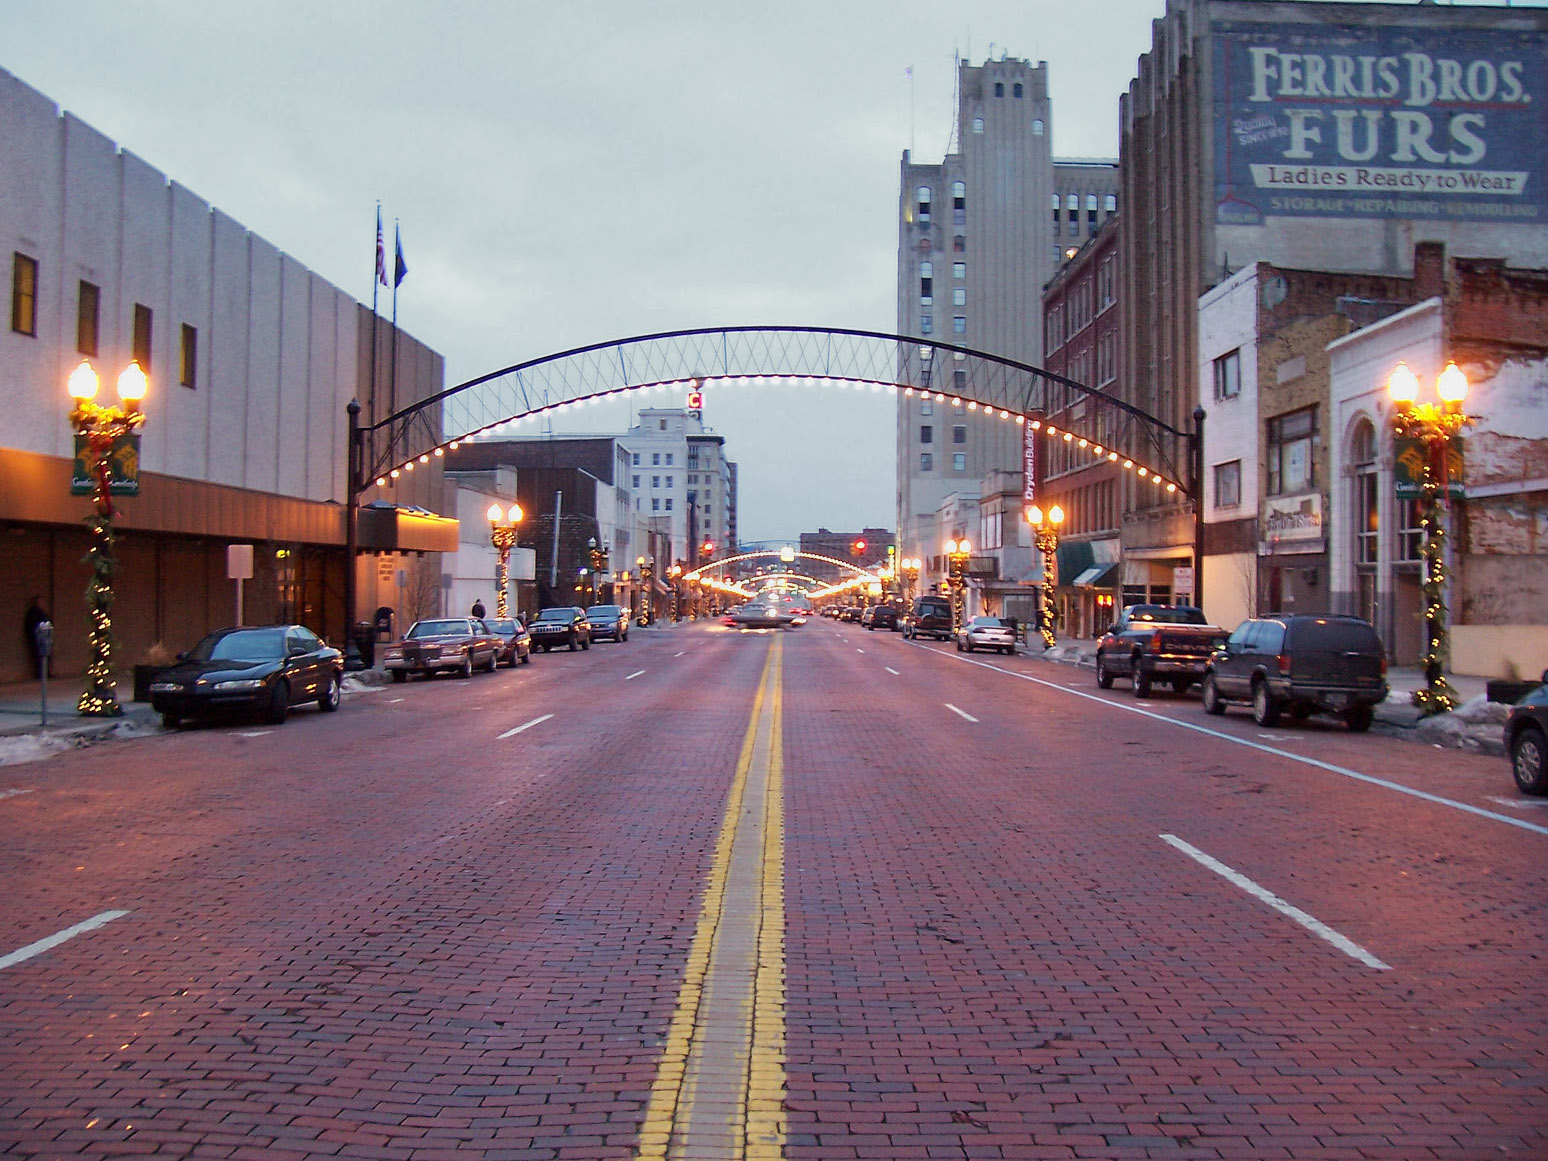 Opinions on Flint, Michigan